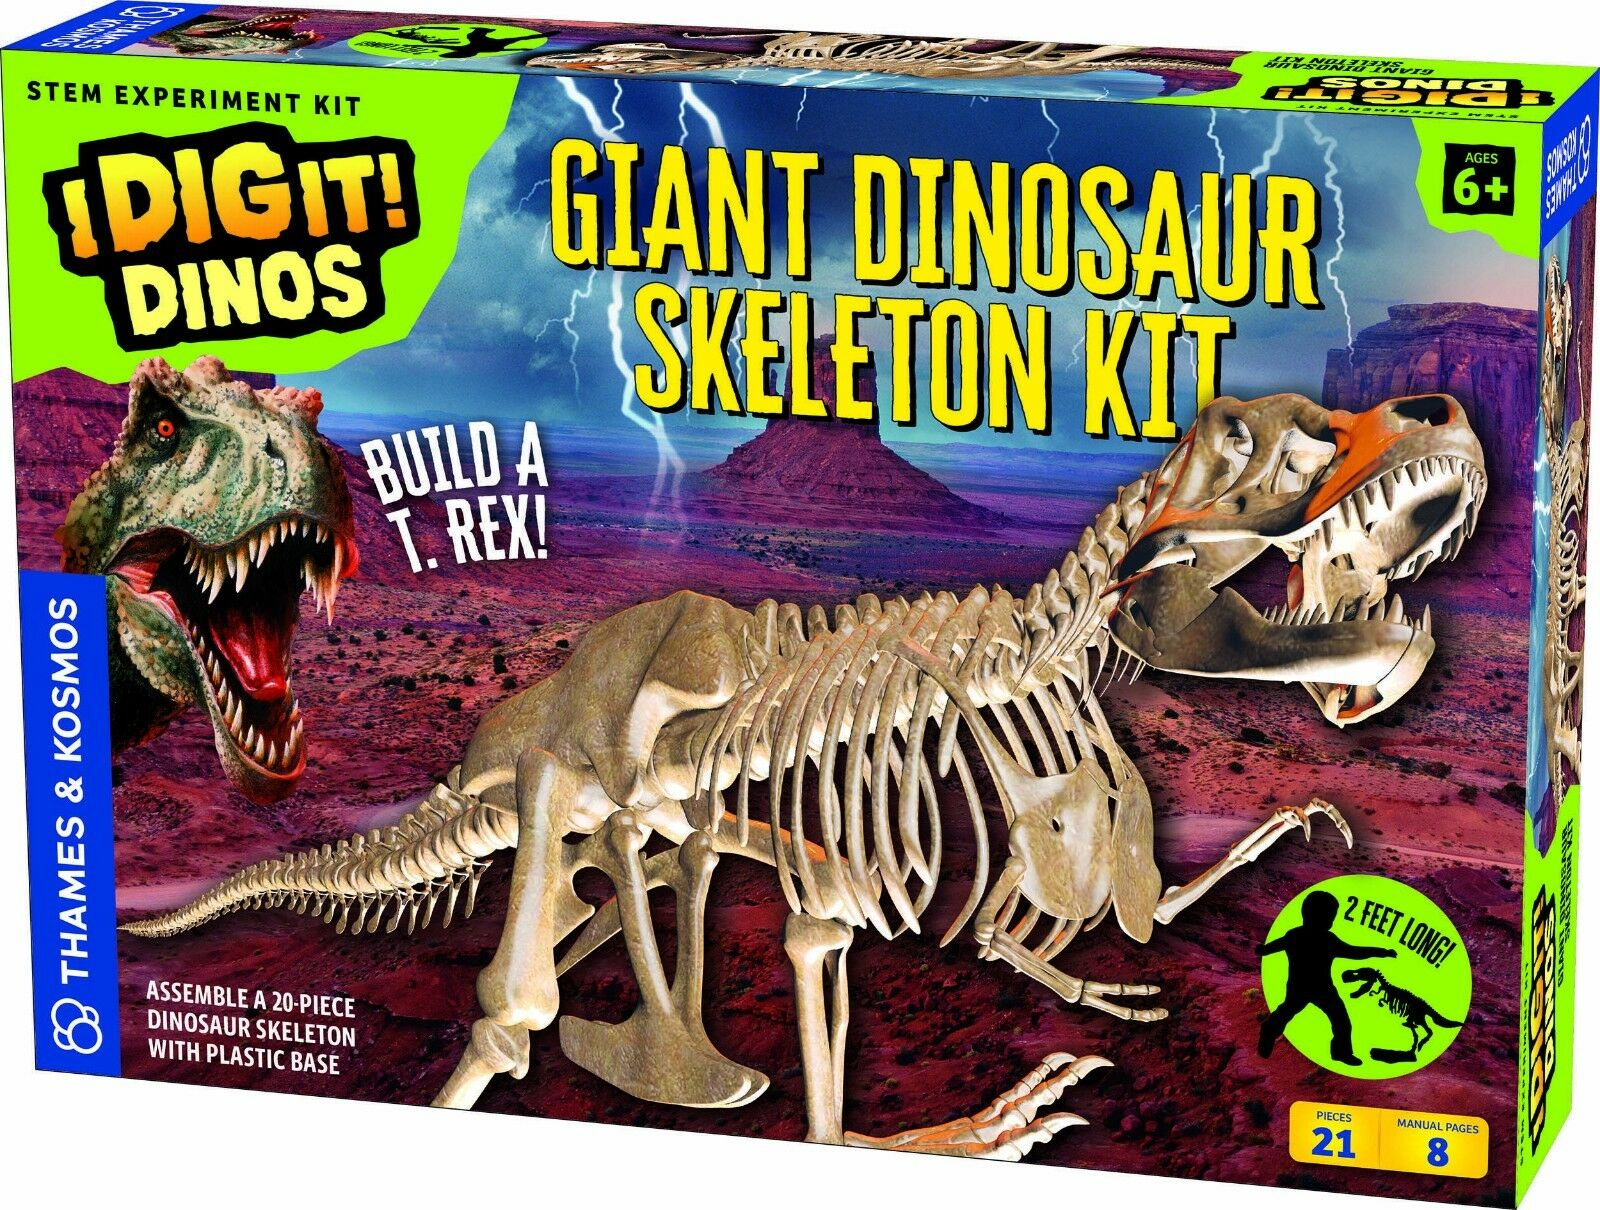 Thames and Kosmos I Dig It  Dinos Giant Dinosaur Skeleton Model Science Kit